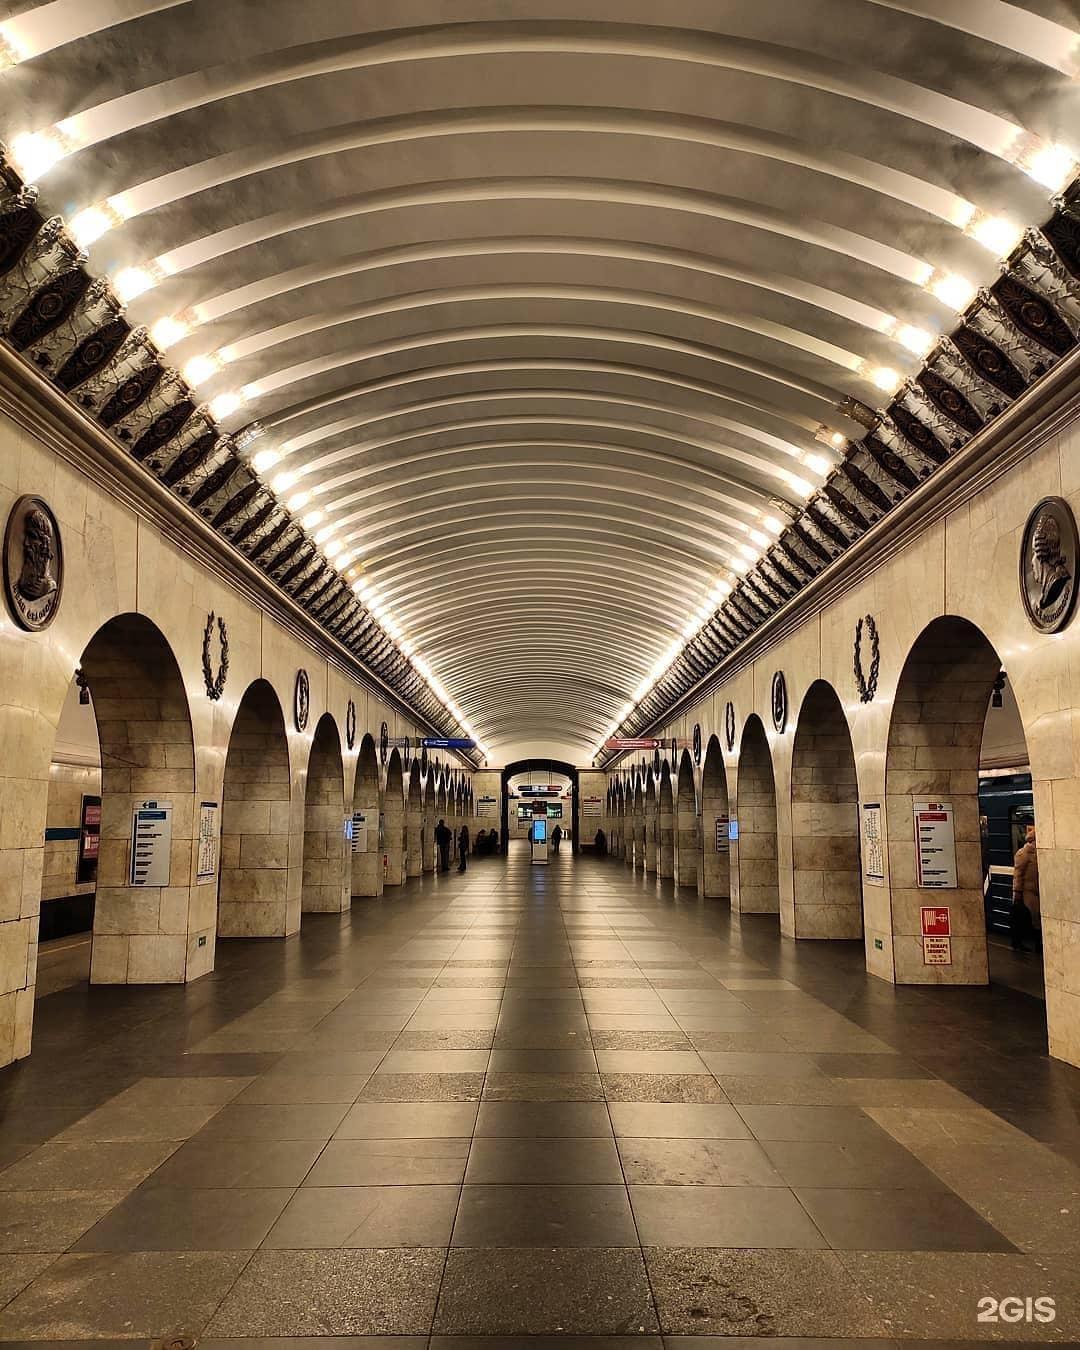 технологический институт метро картинки государственном